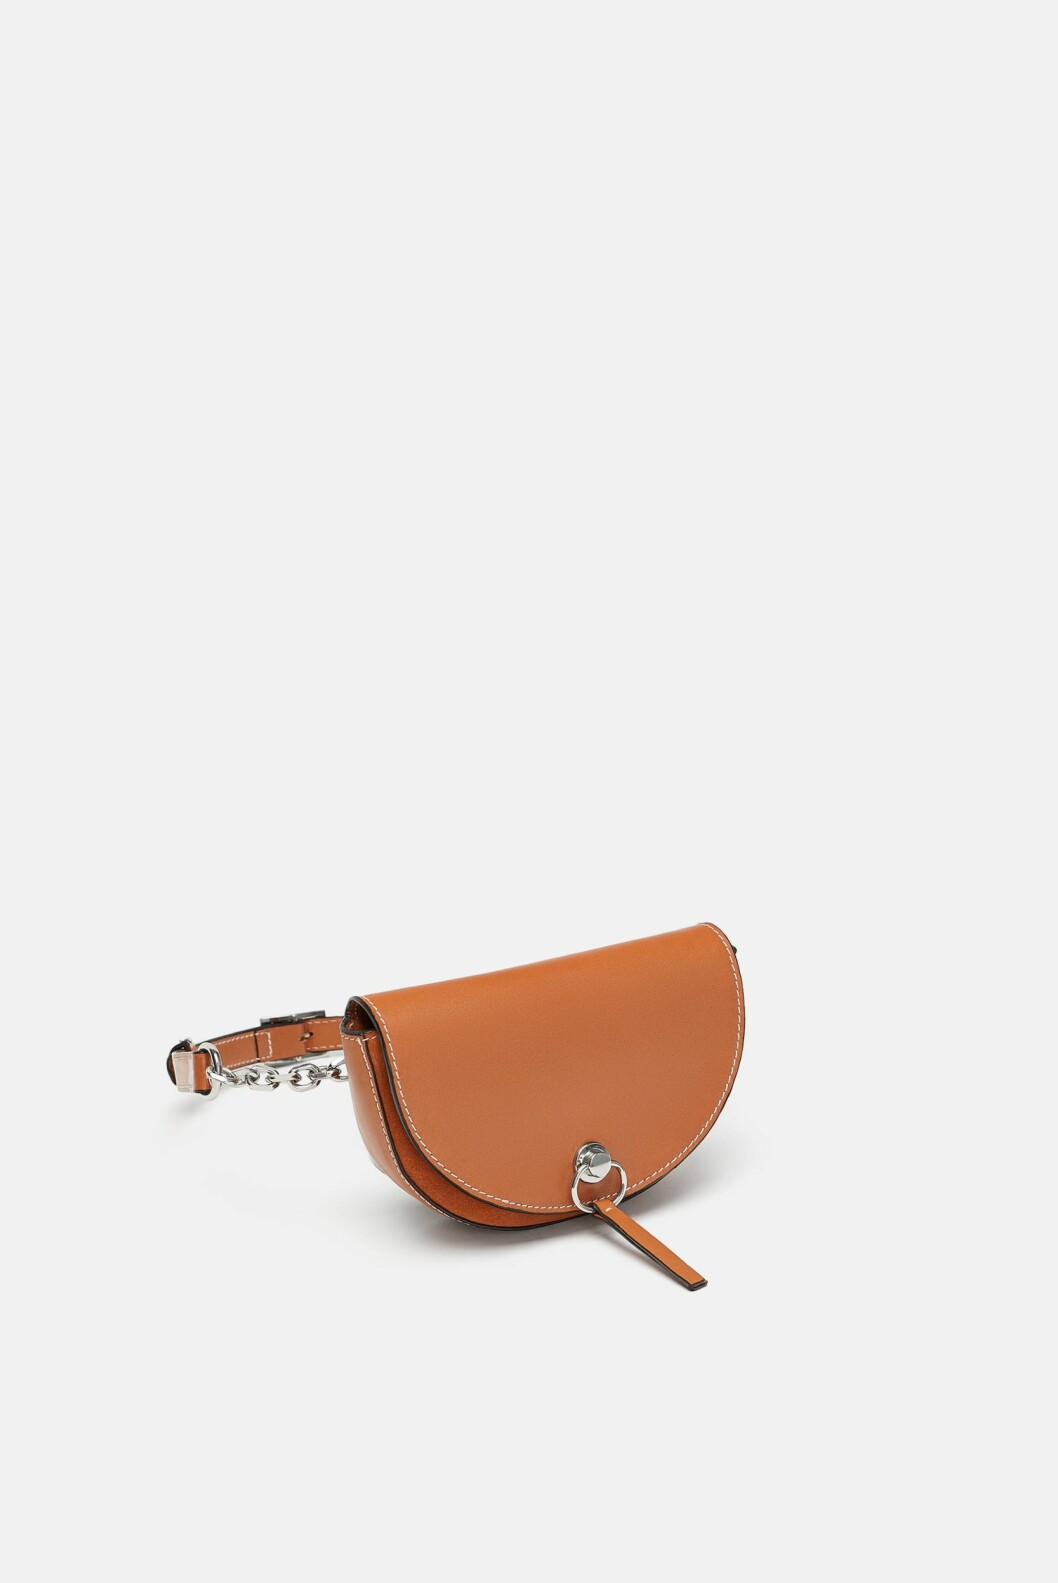 Rumpetaske fra Zara  560,-  https://www.zara.com/no/no/kombinert-rumpetaske-i-skinn-p15676304.html?v1=6963603&v2=1074708